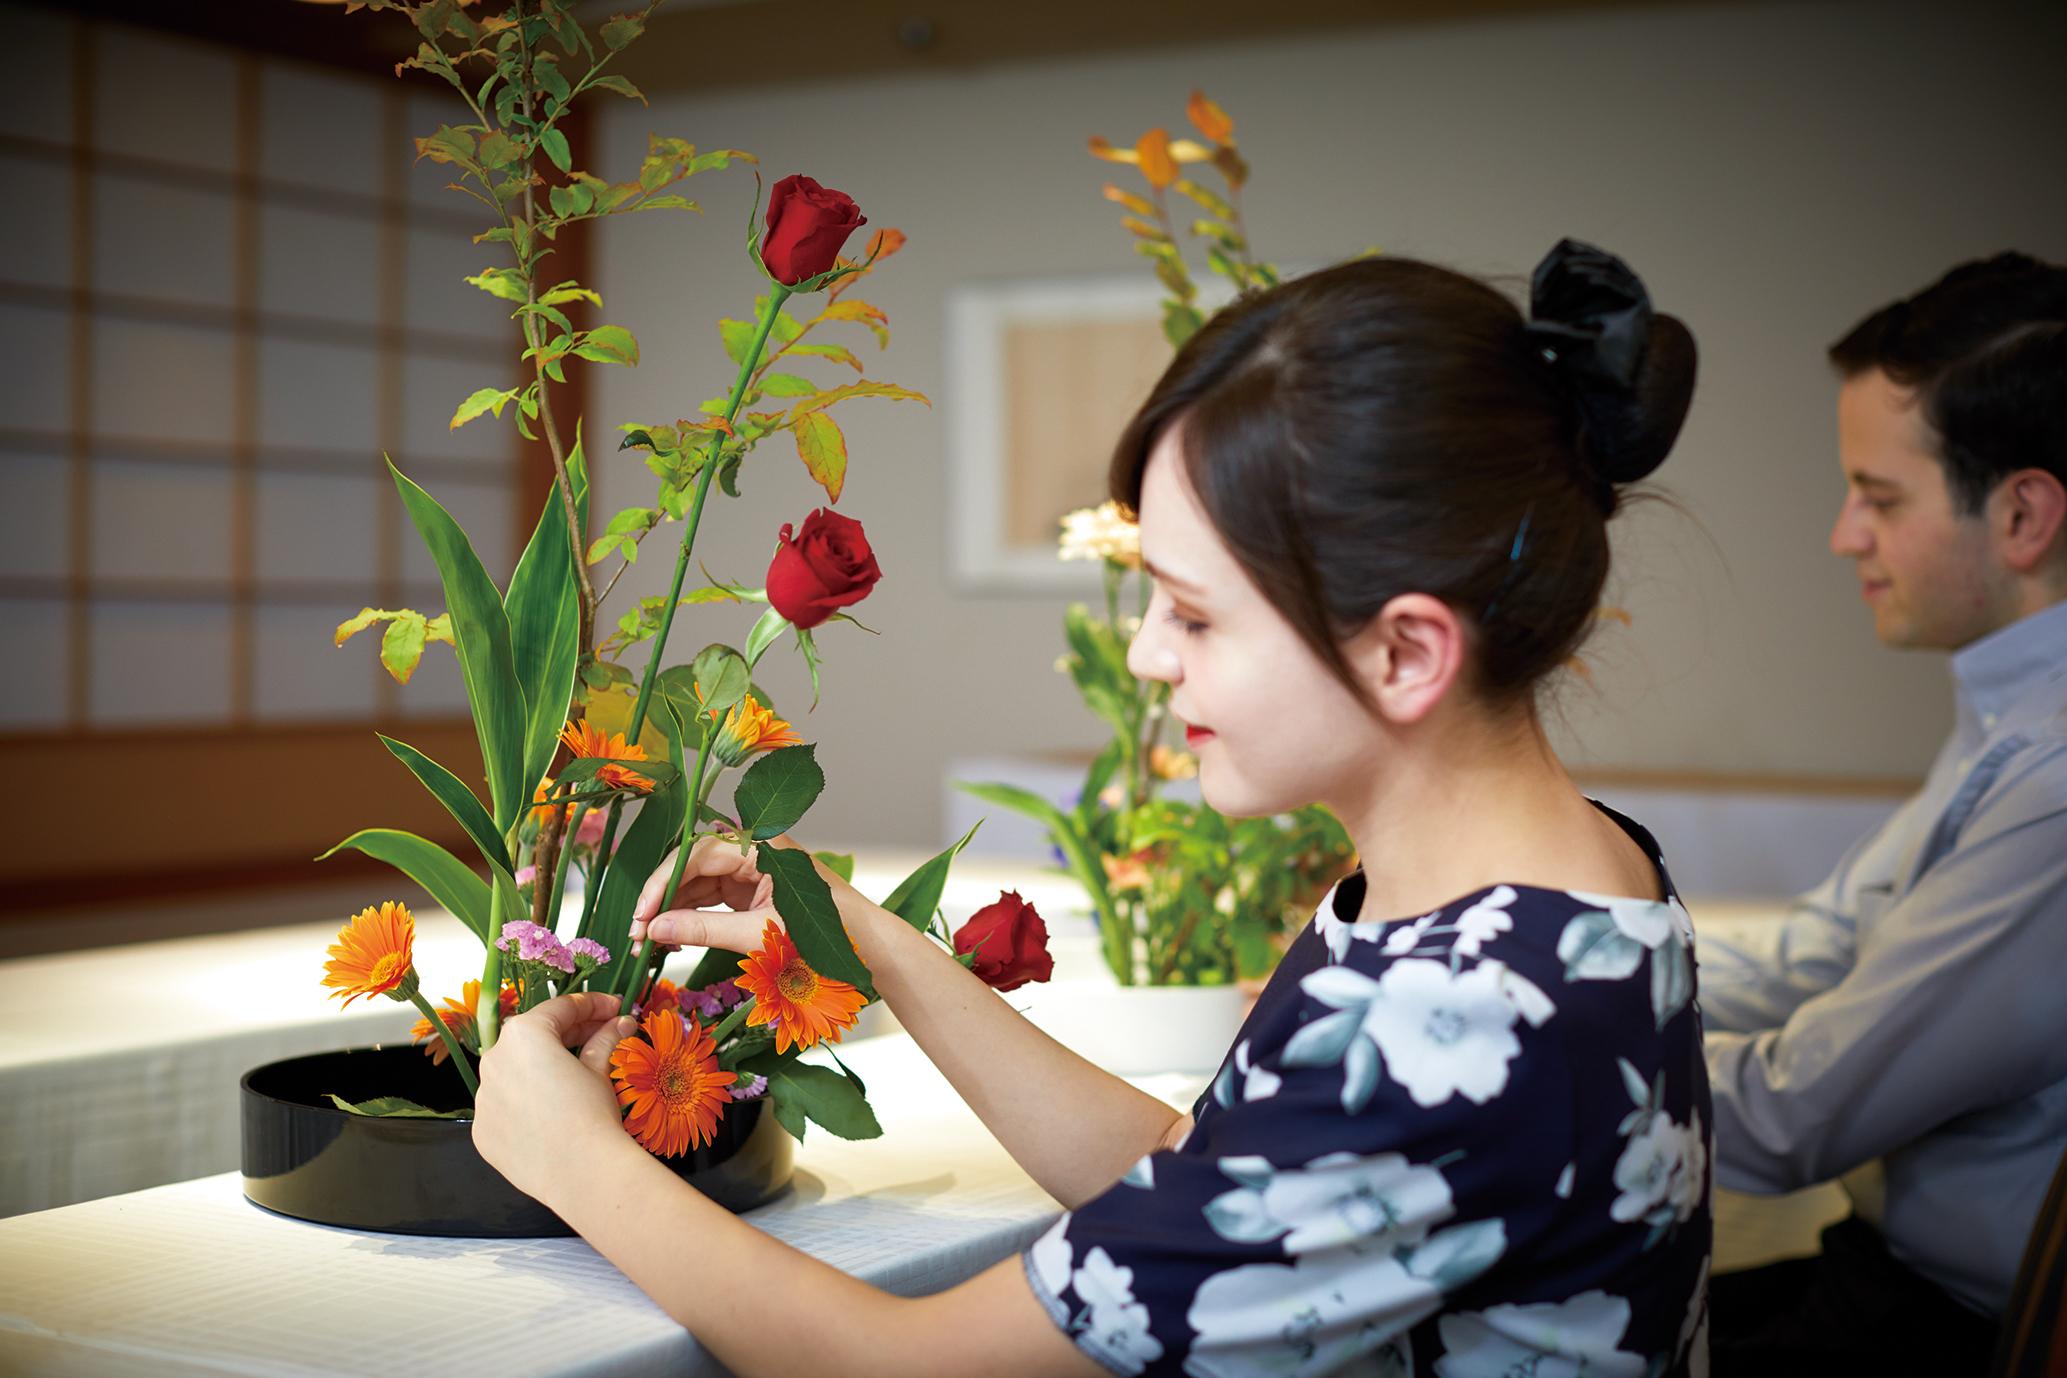 Intellasia East Asia News Keio Plaza Hotel Tokyo Starts Ikebana Flower Arrangement Workshops